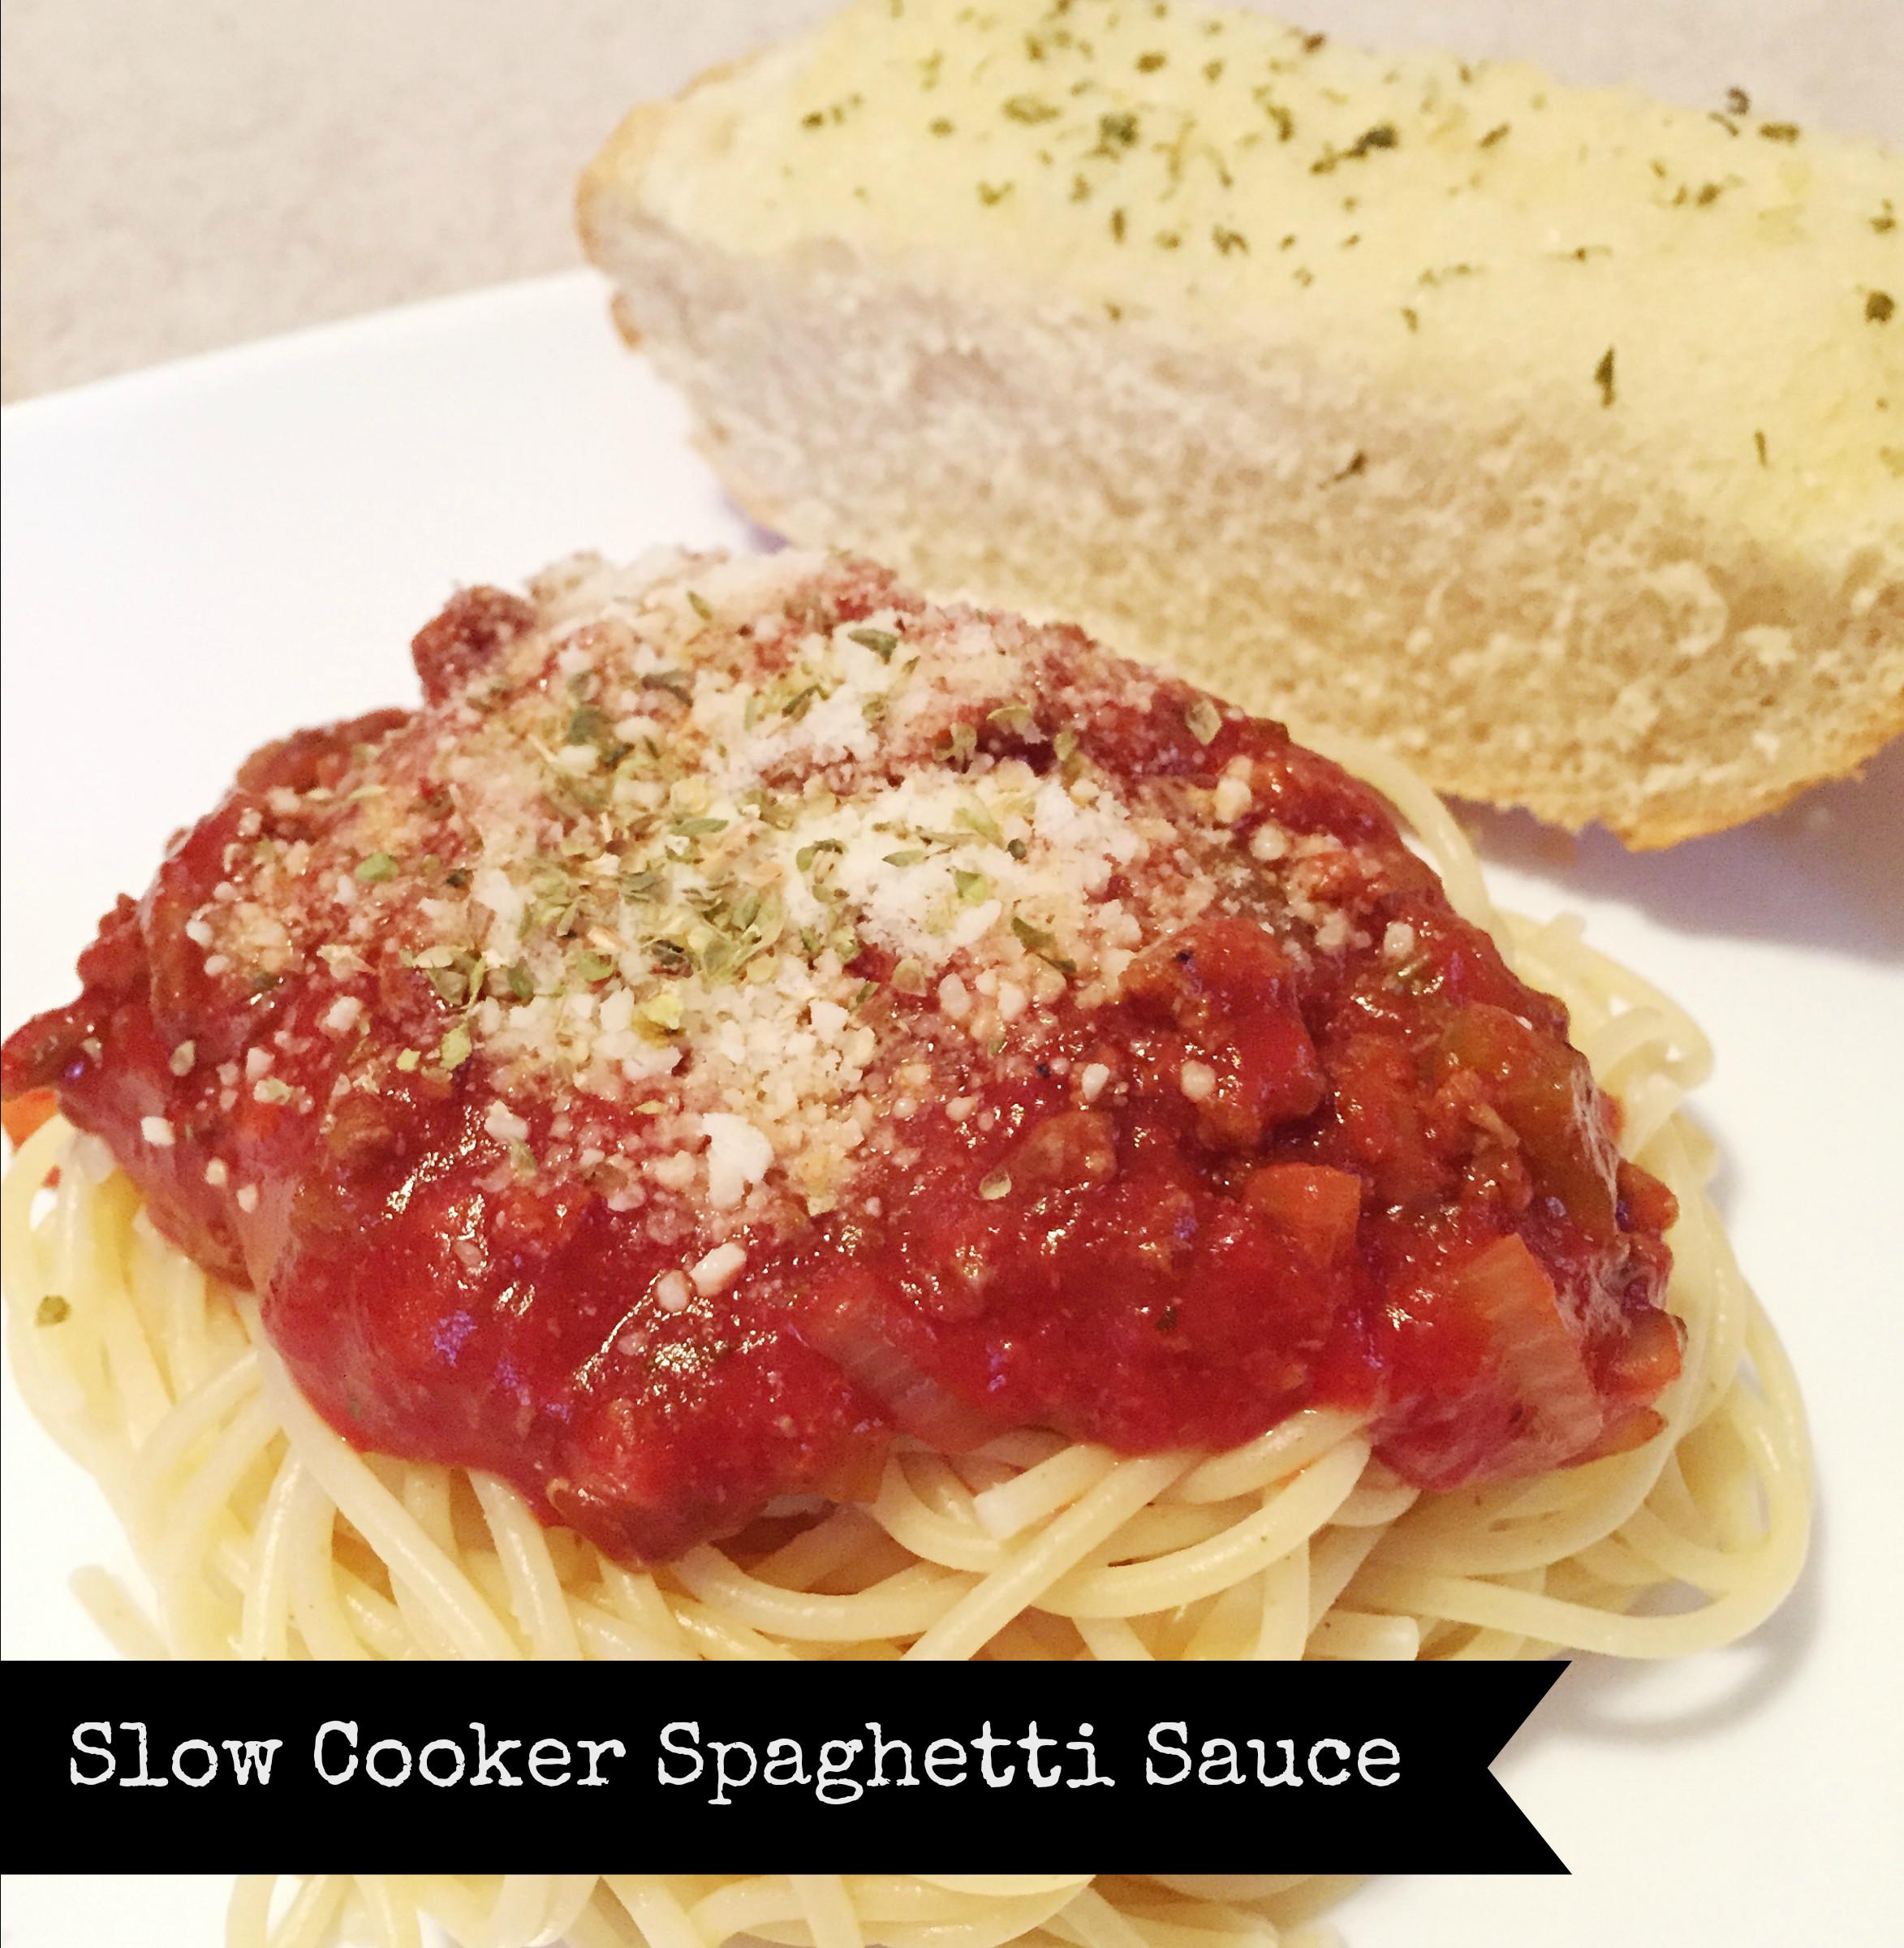 Slow Cooker Spaghetti Sauce  RECIPE Slow Cooker Spaghetti Sauce Bits of Bee